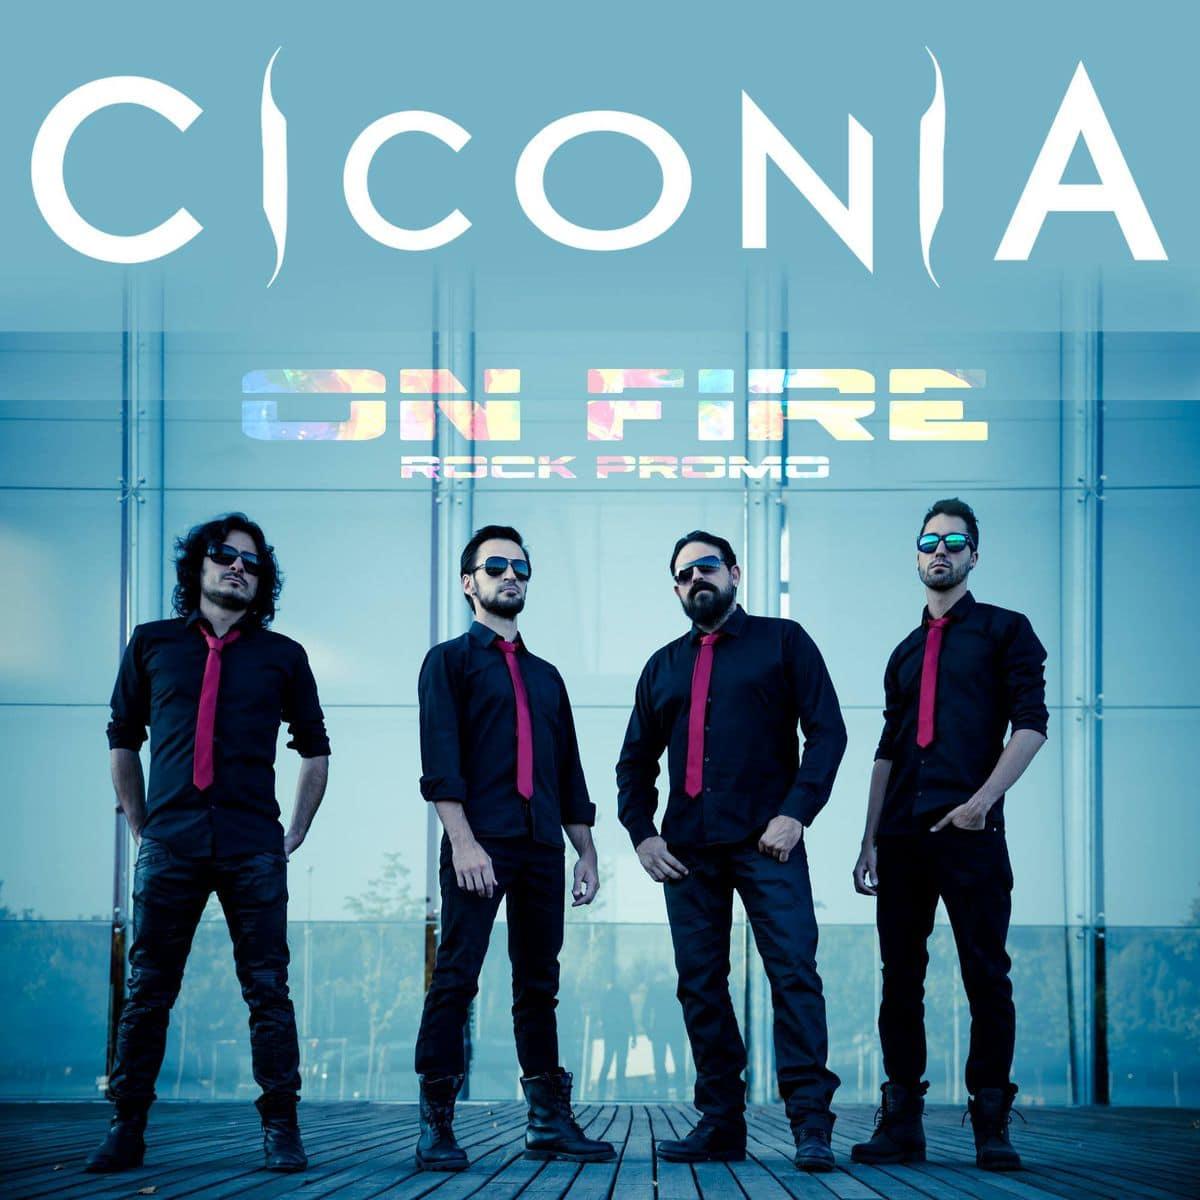 CICONIA – Alburock 2014 – SOMAGNET (BRA)